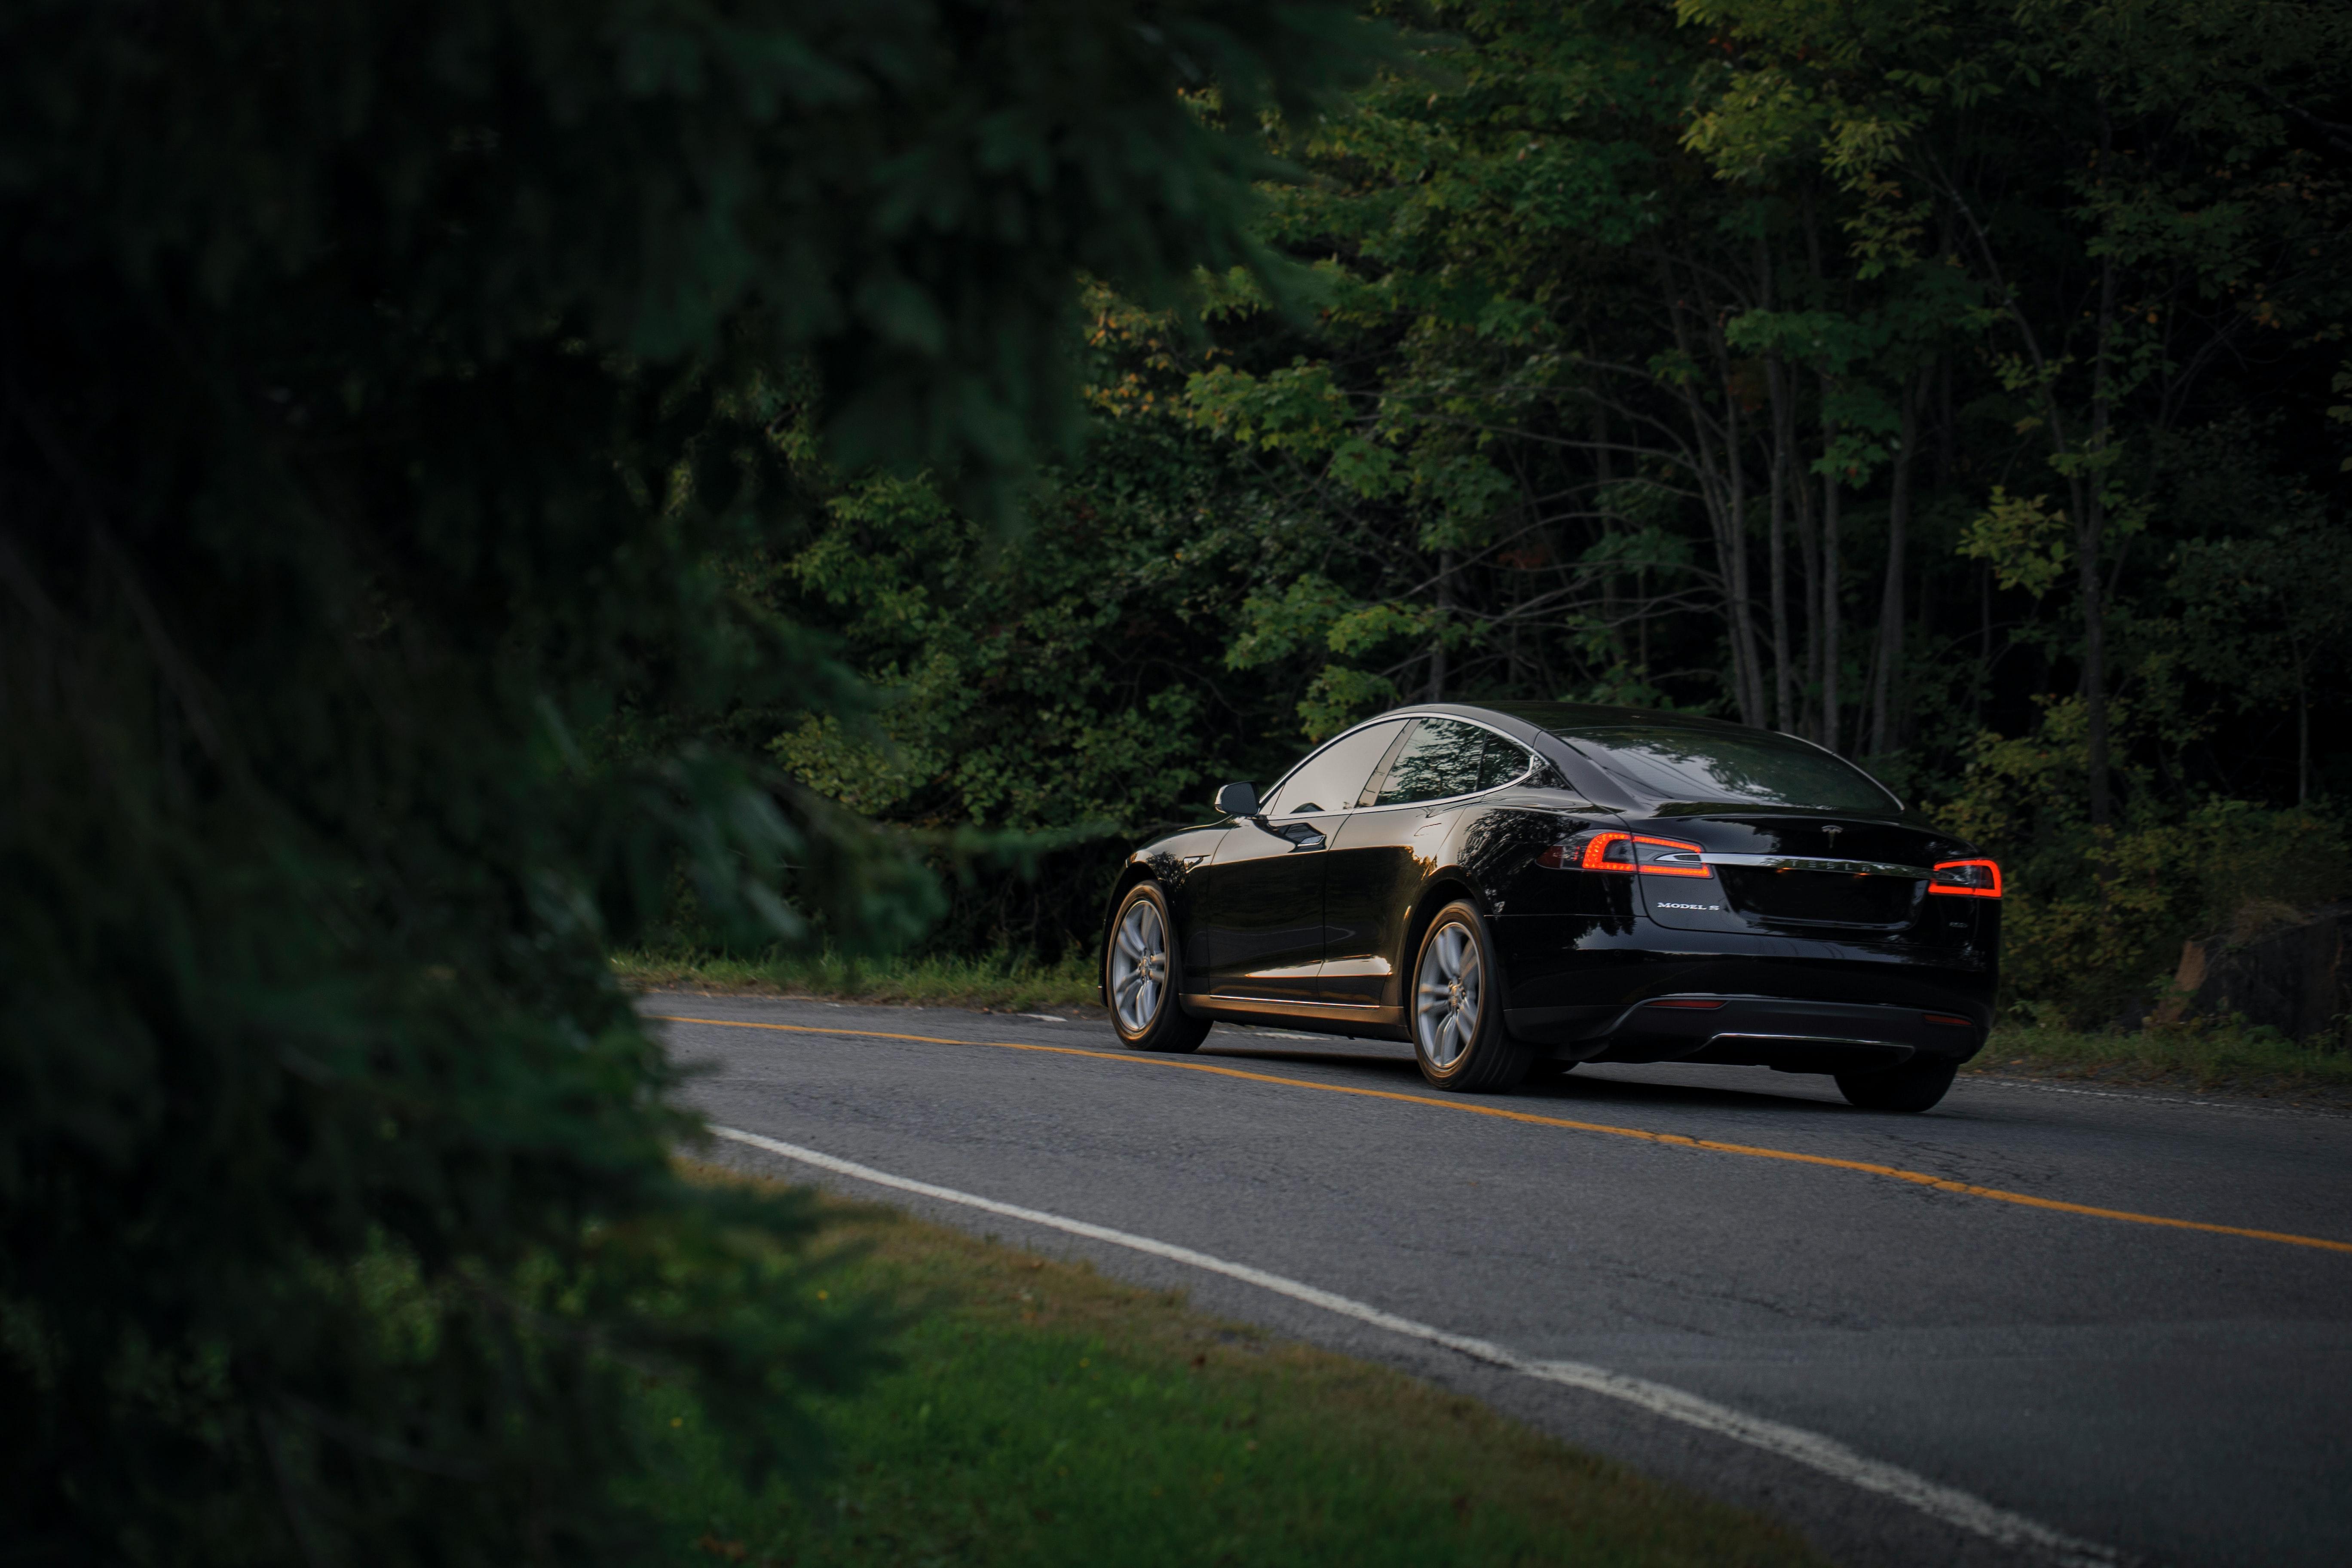 carro eletrico na estrada entre arvores